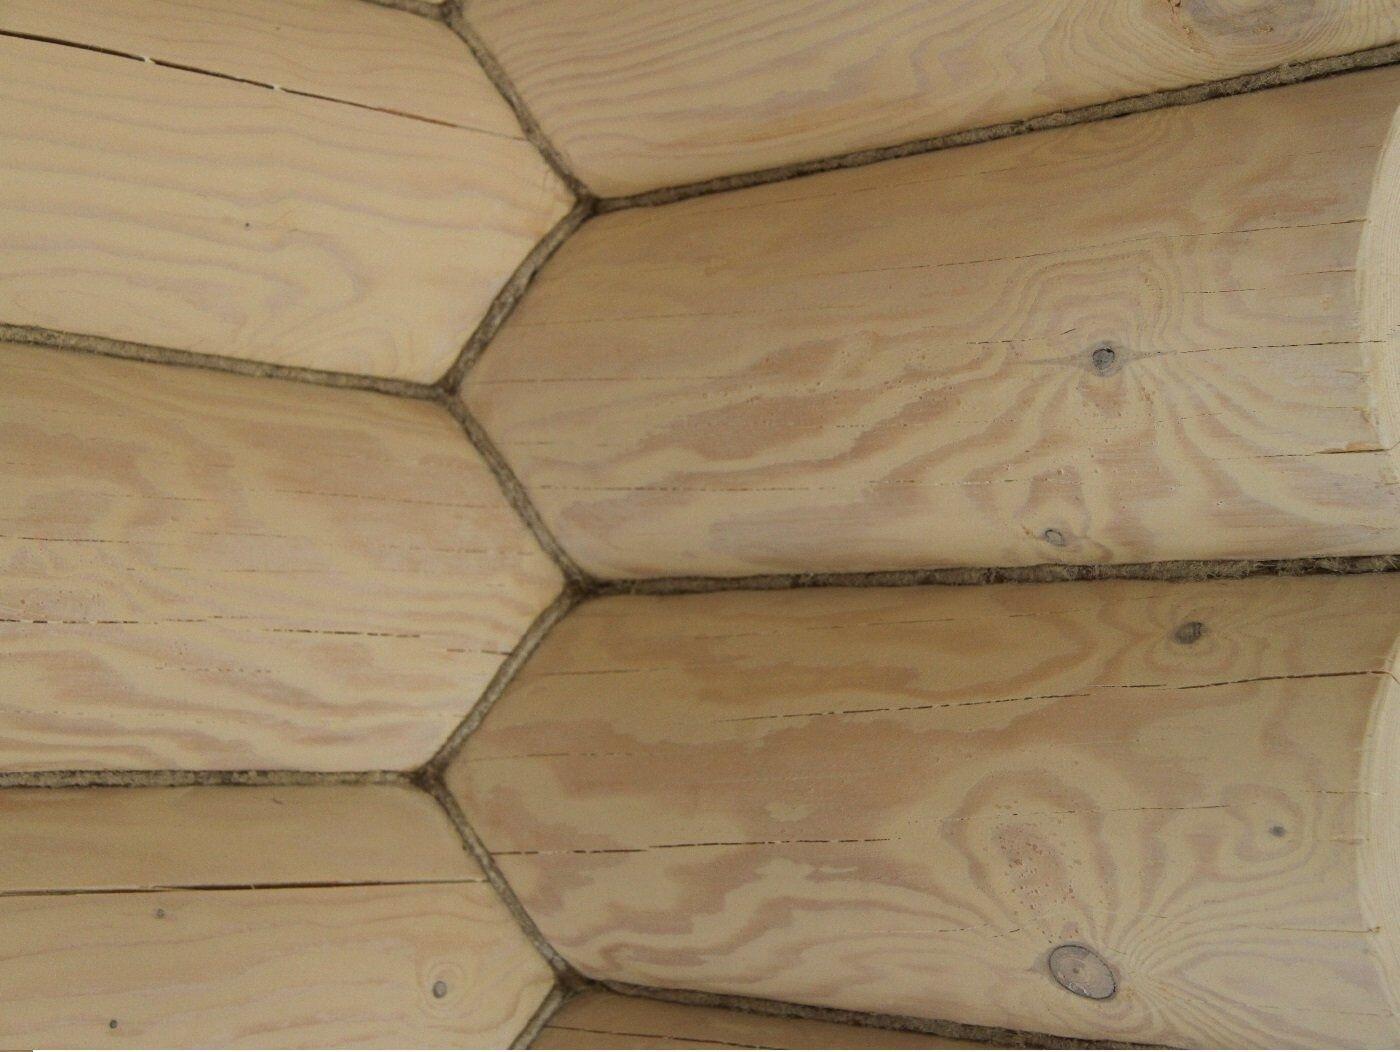 Конопатка дома из оцилиндрованного бревна. Бани. Цена, стоимость работ - фото pic_3fabe0a5990b544_1920x9000_1.jpg